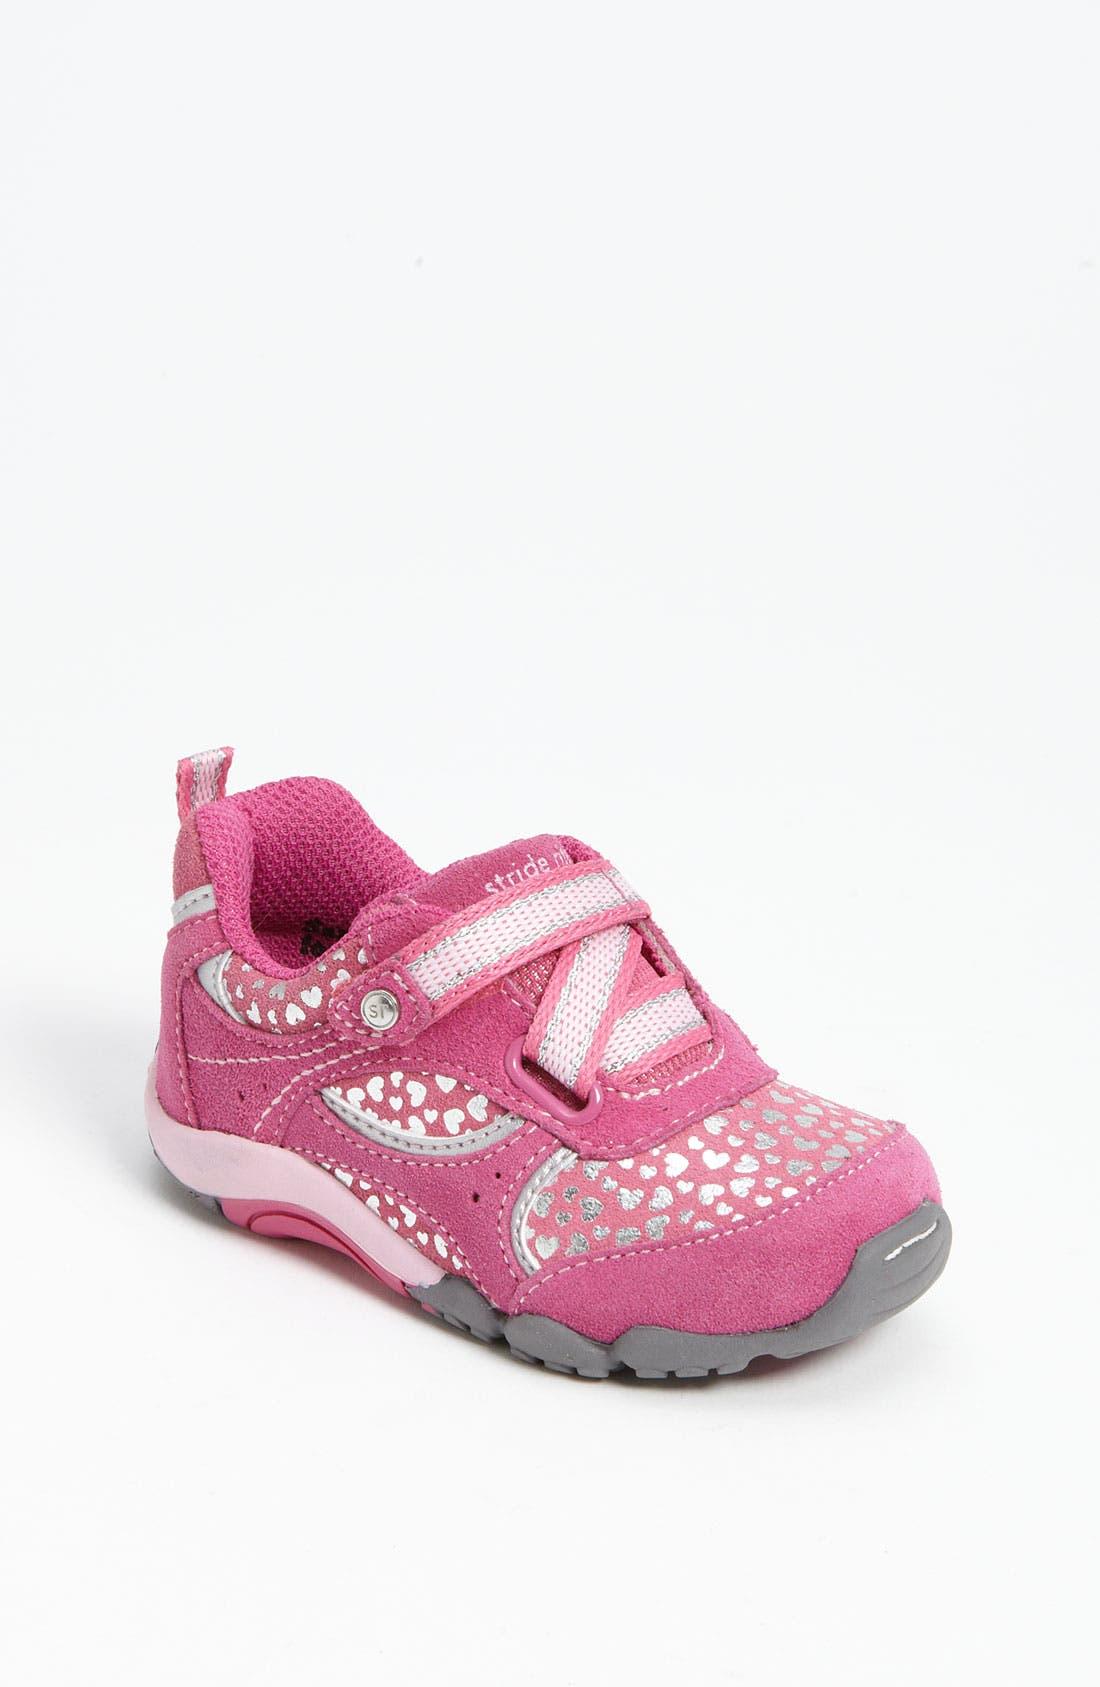 Main Image - Stride Rite 'Misty' Sneaker (Baby, Walker & Toddler)